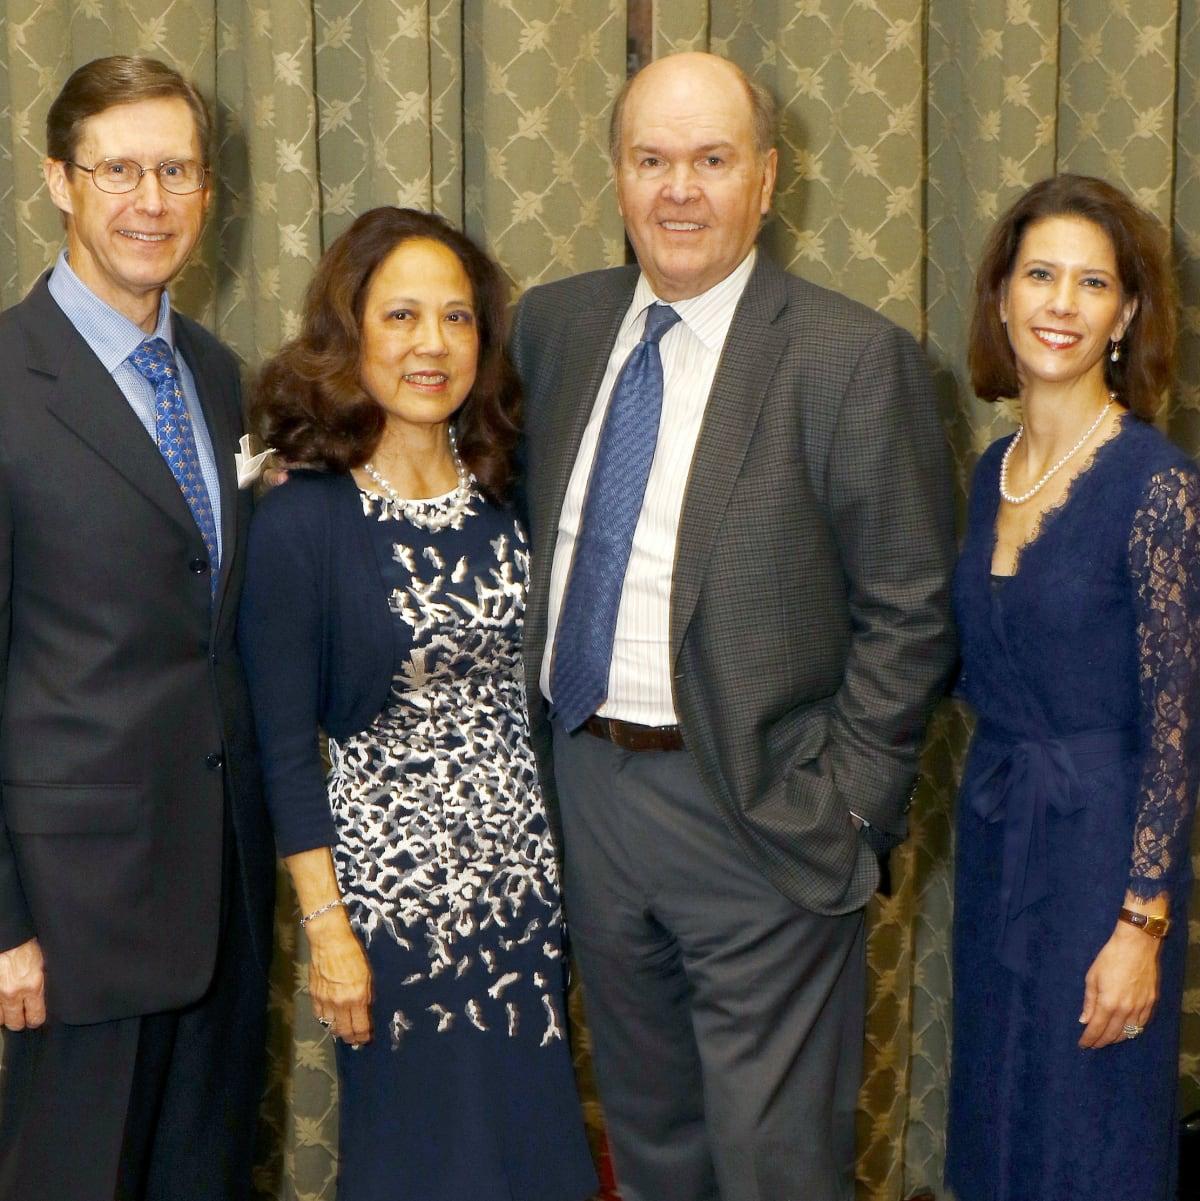 James Sakett, Dr. Kimberly Yamanouchi, Mark Craig, Sarah Fletcher